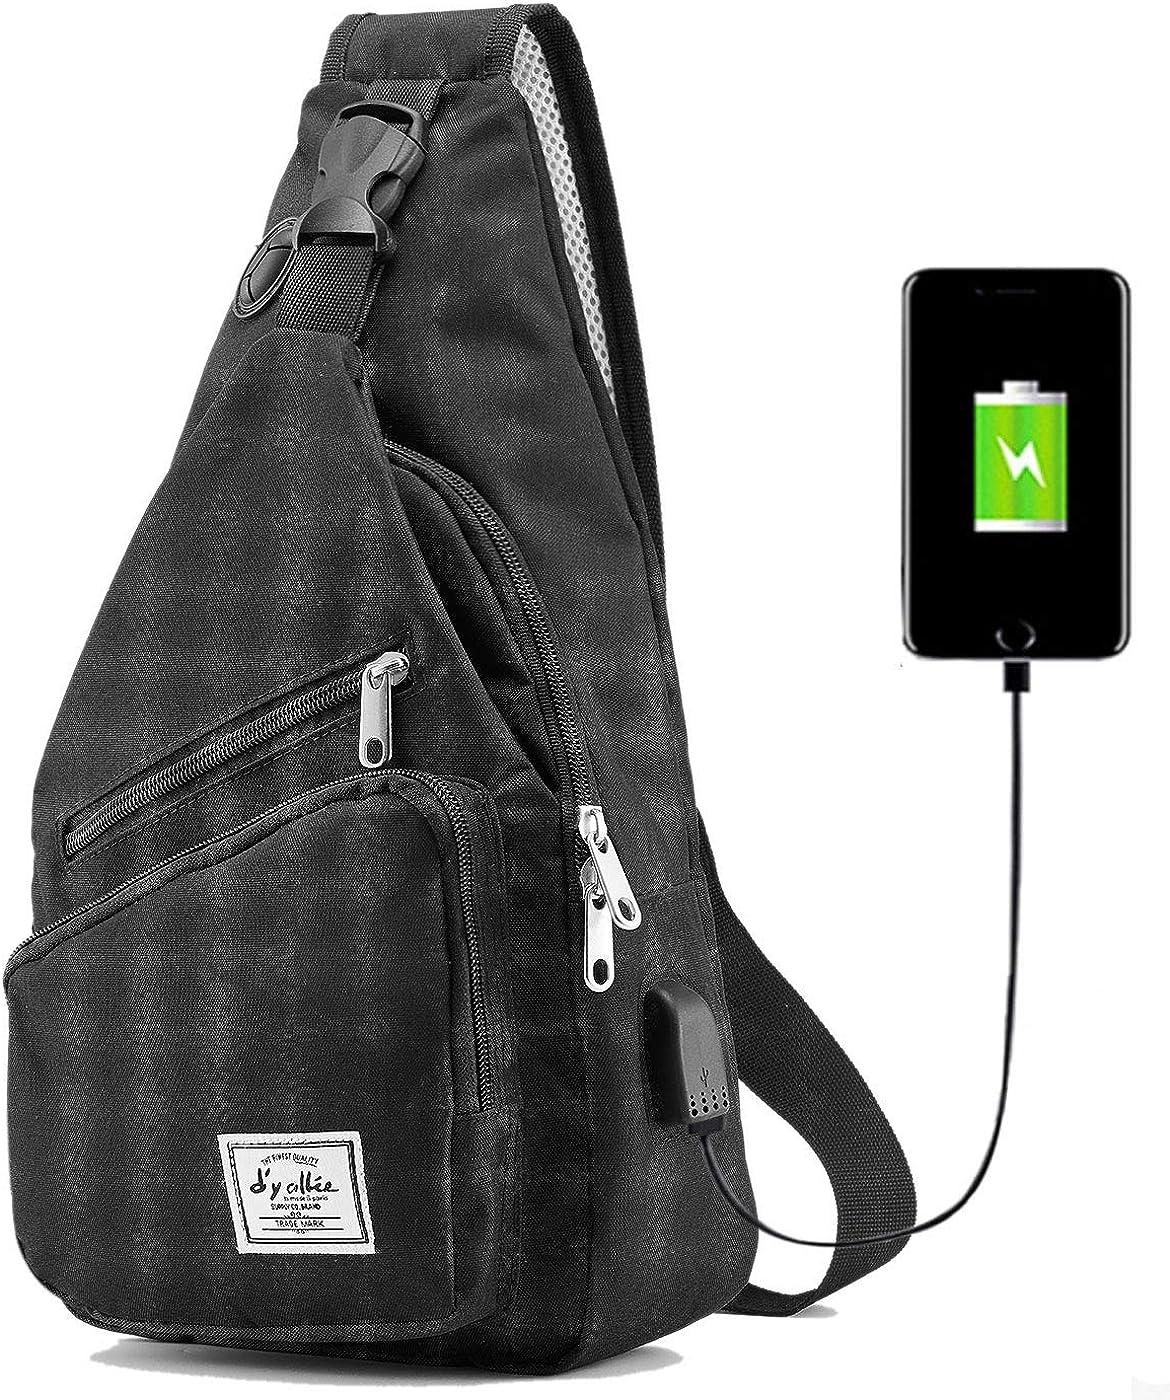 Mens Bags Sport Travel Hiking Gym Cross Body Messenger Shoulder Sling Chest Pack